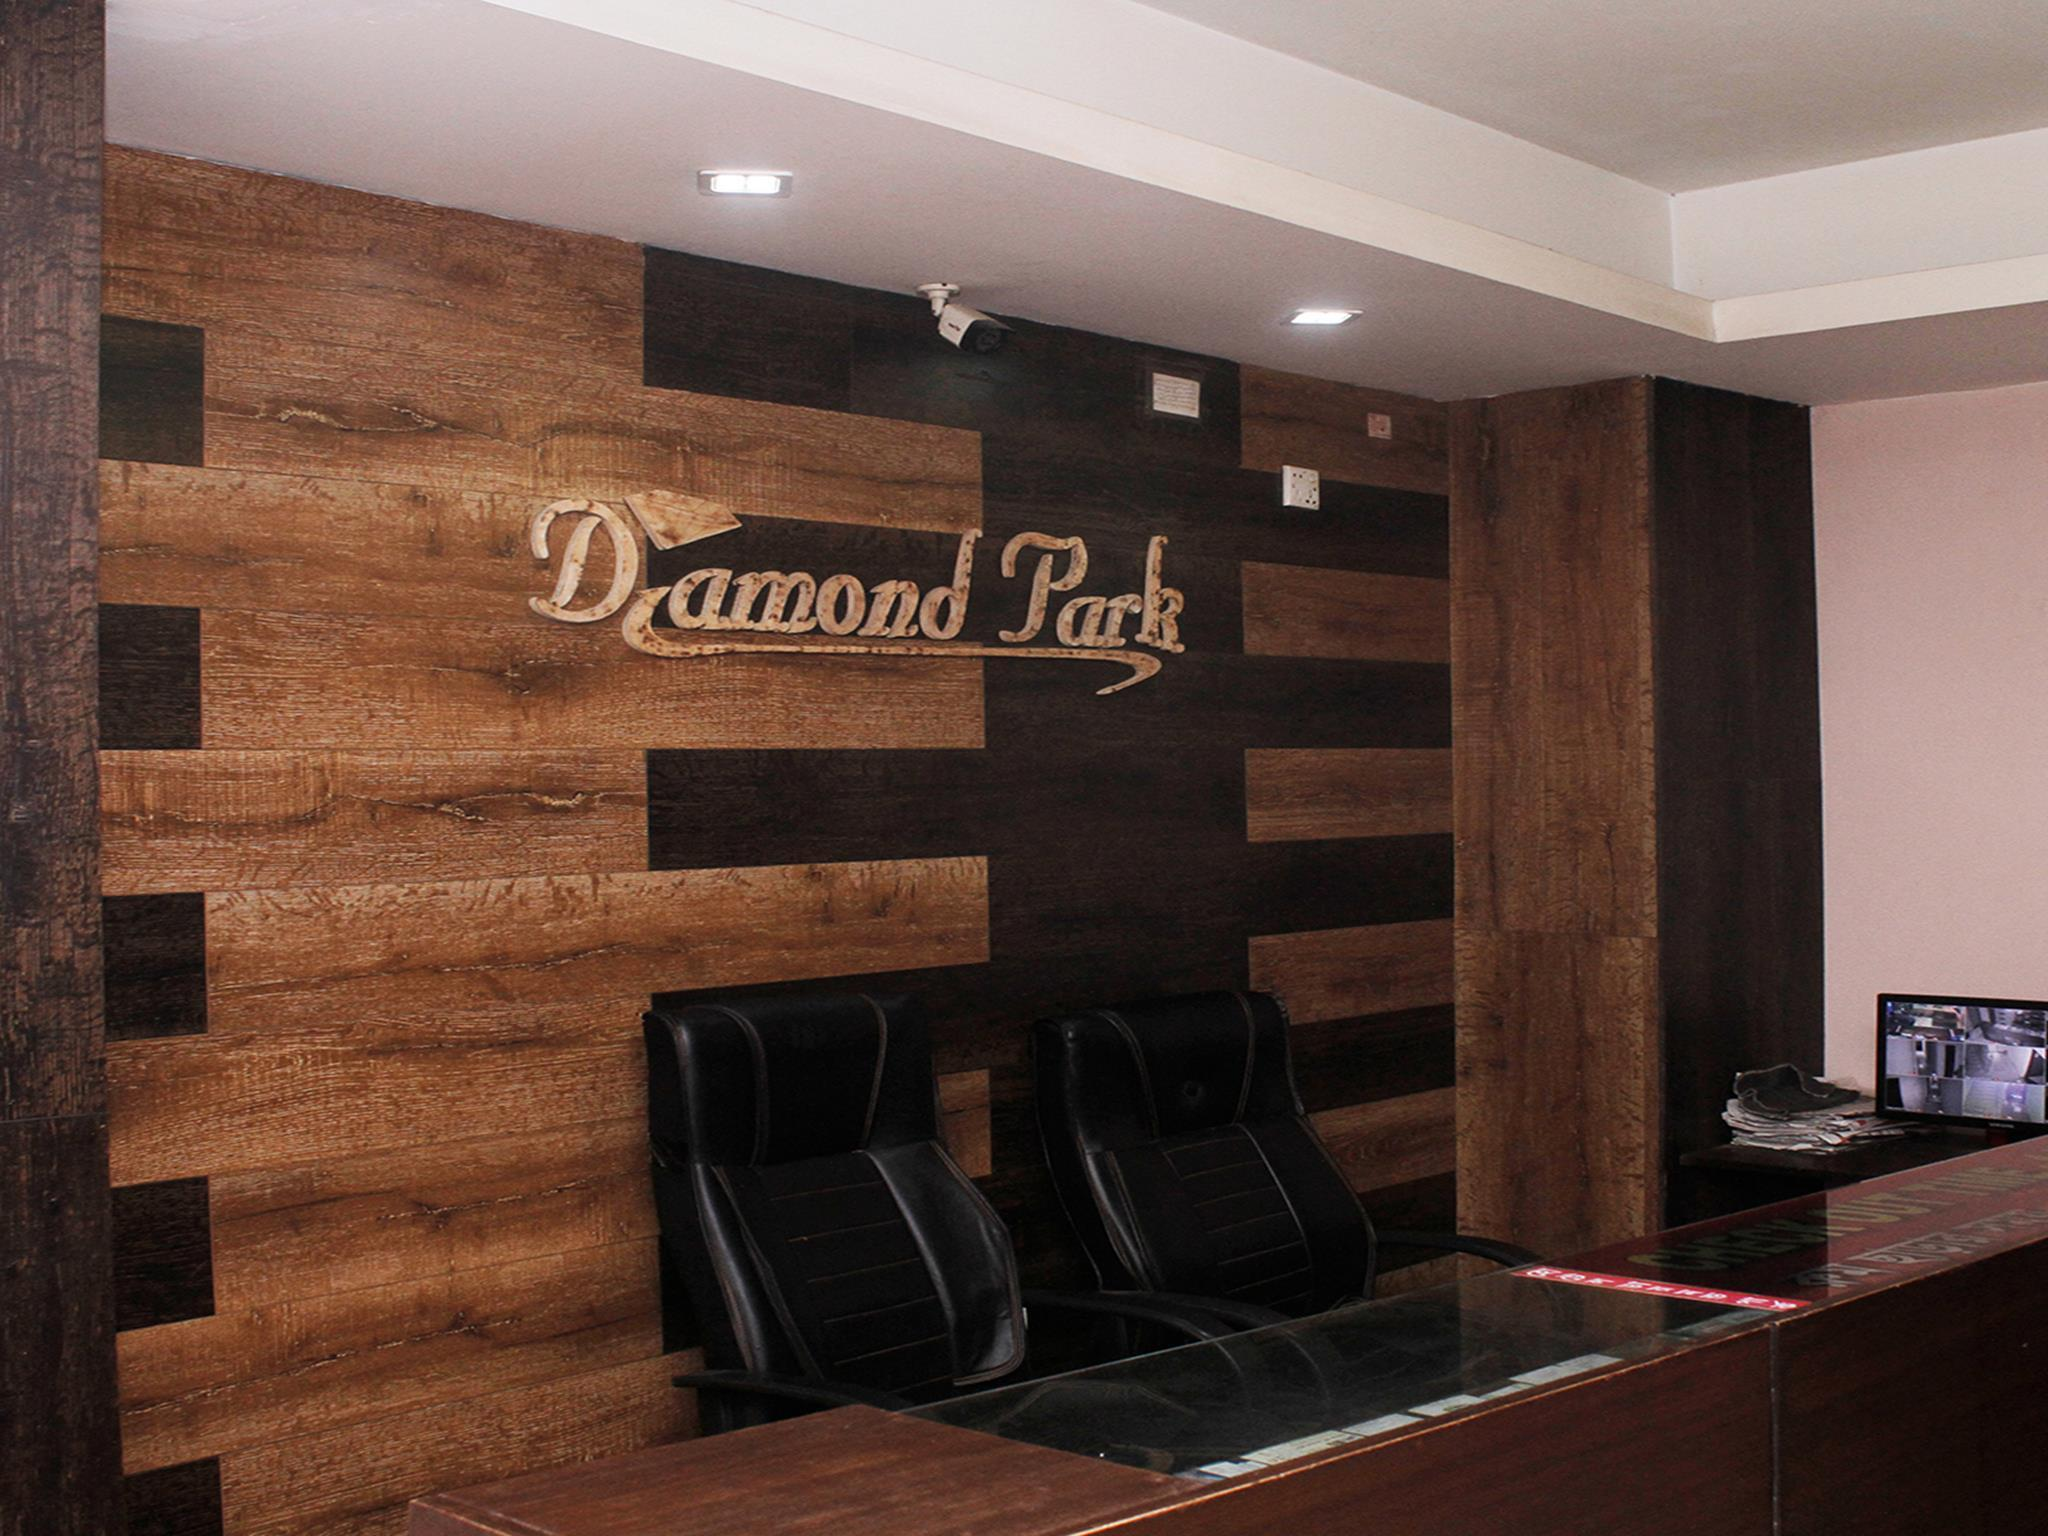 Hotel Diamond Park